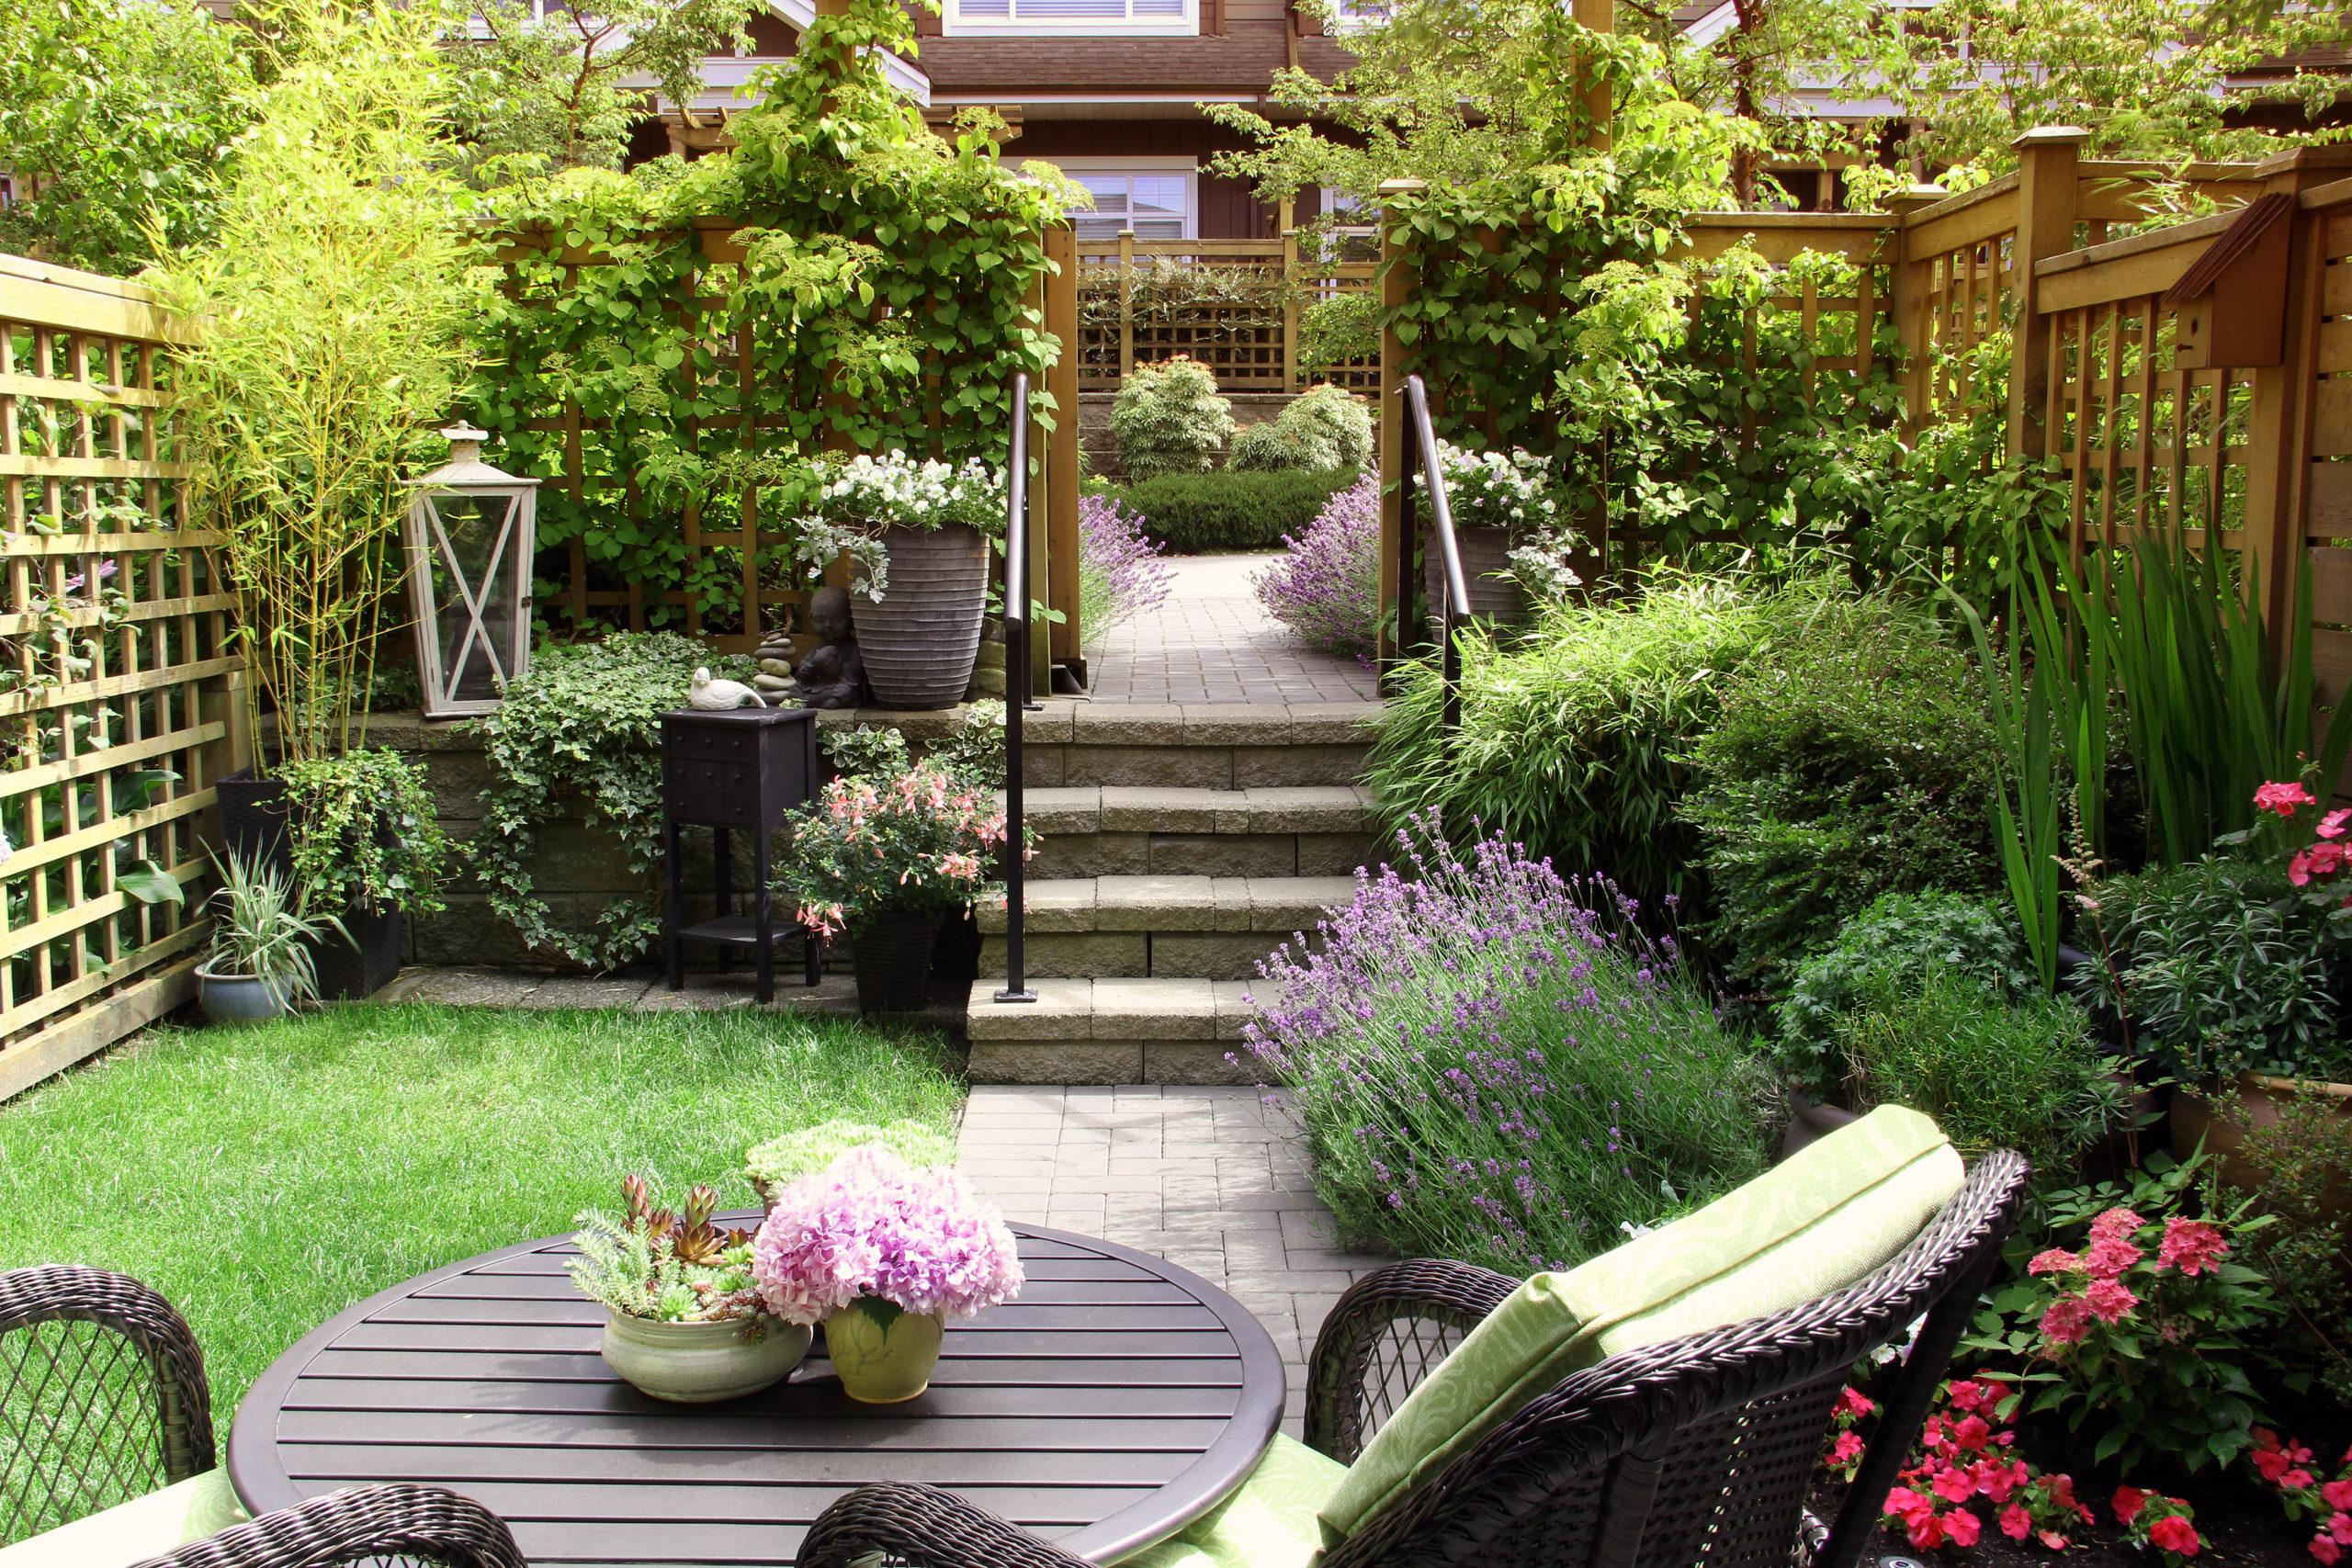 garden-ornaments-1 100+ Surprising Garden Design Ideas You Should Not Miss in 2021